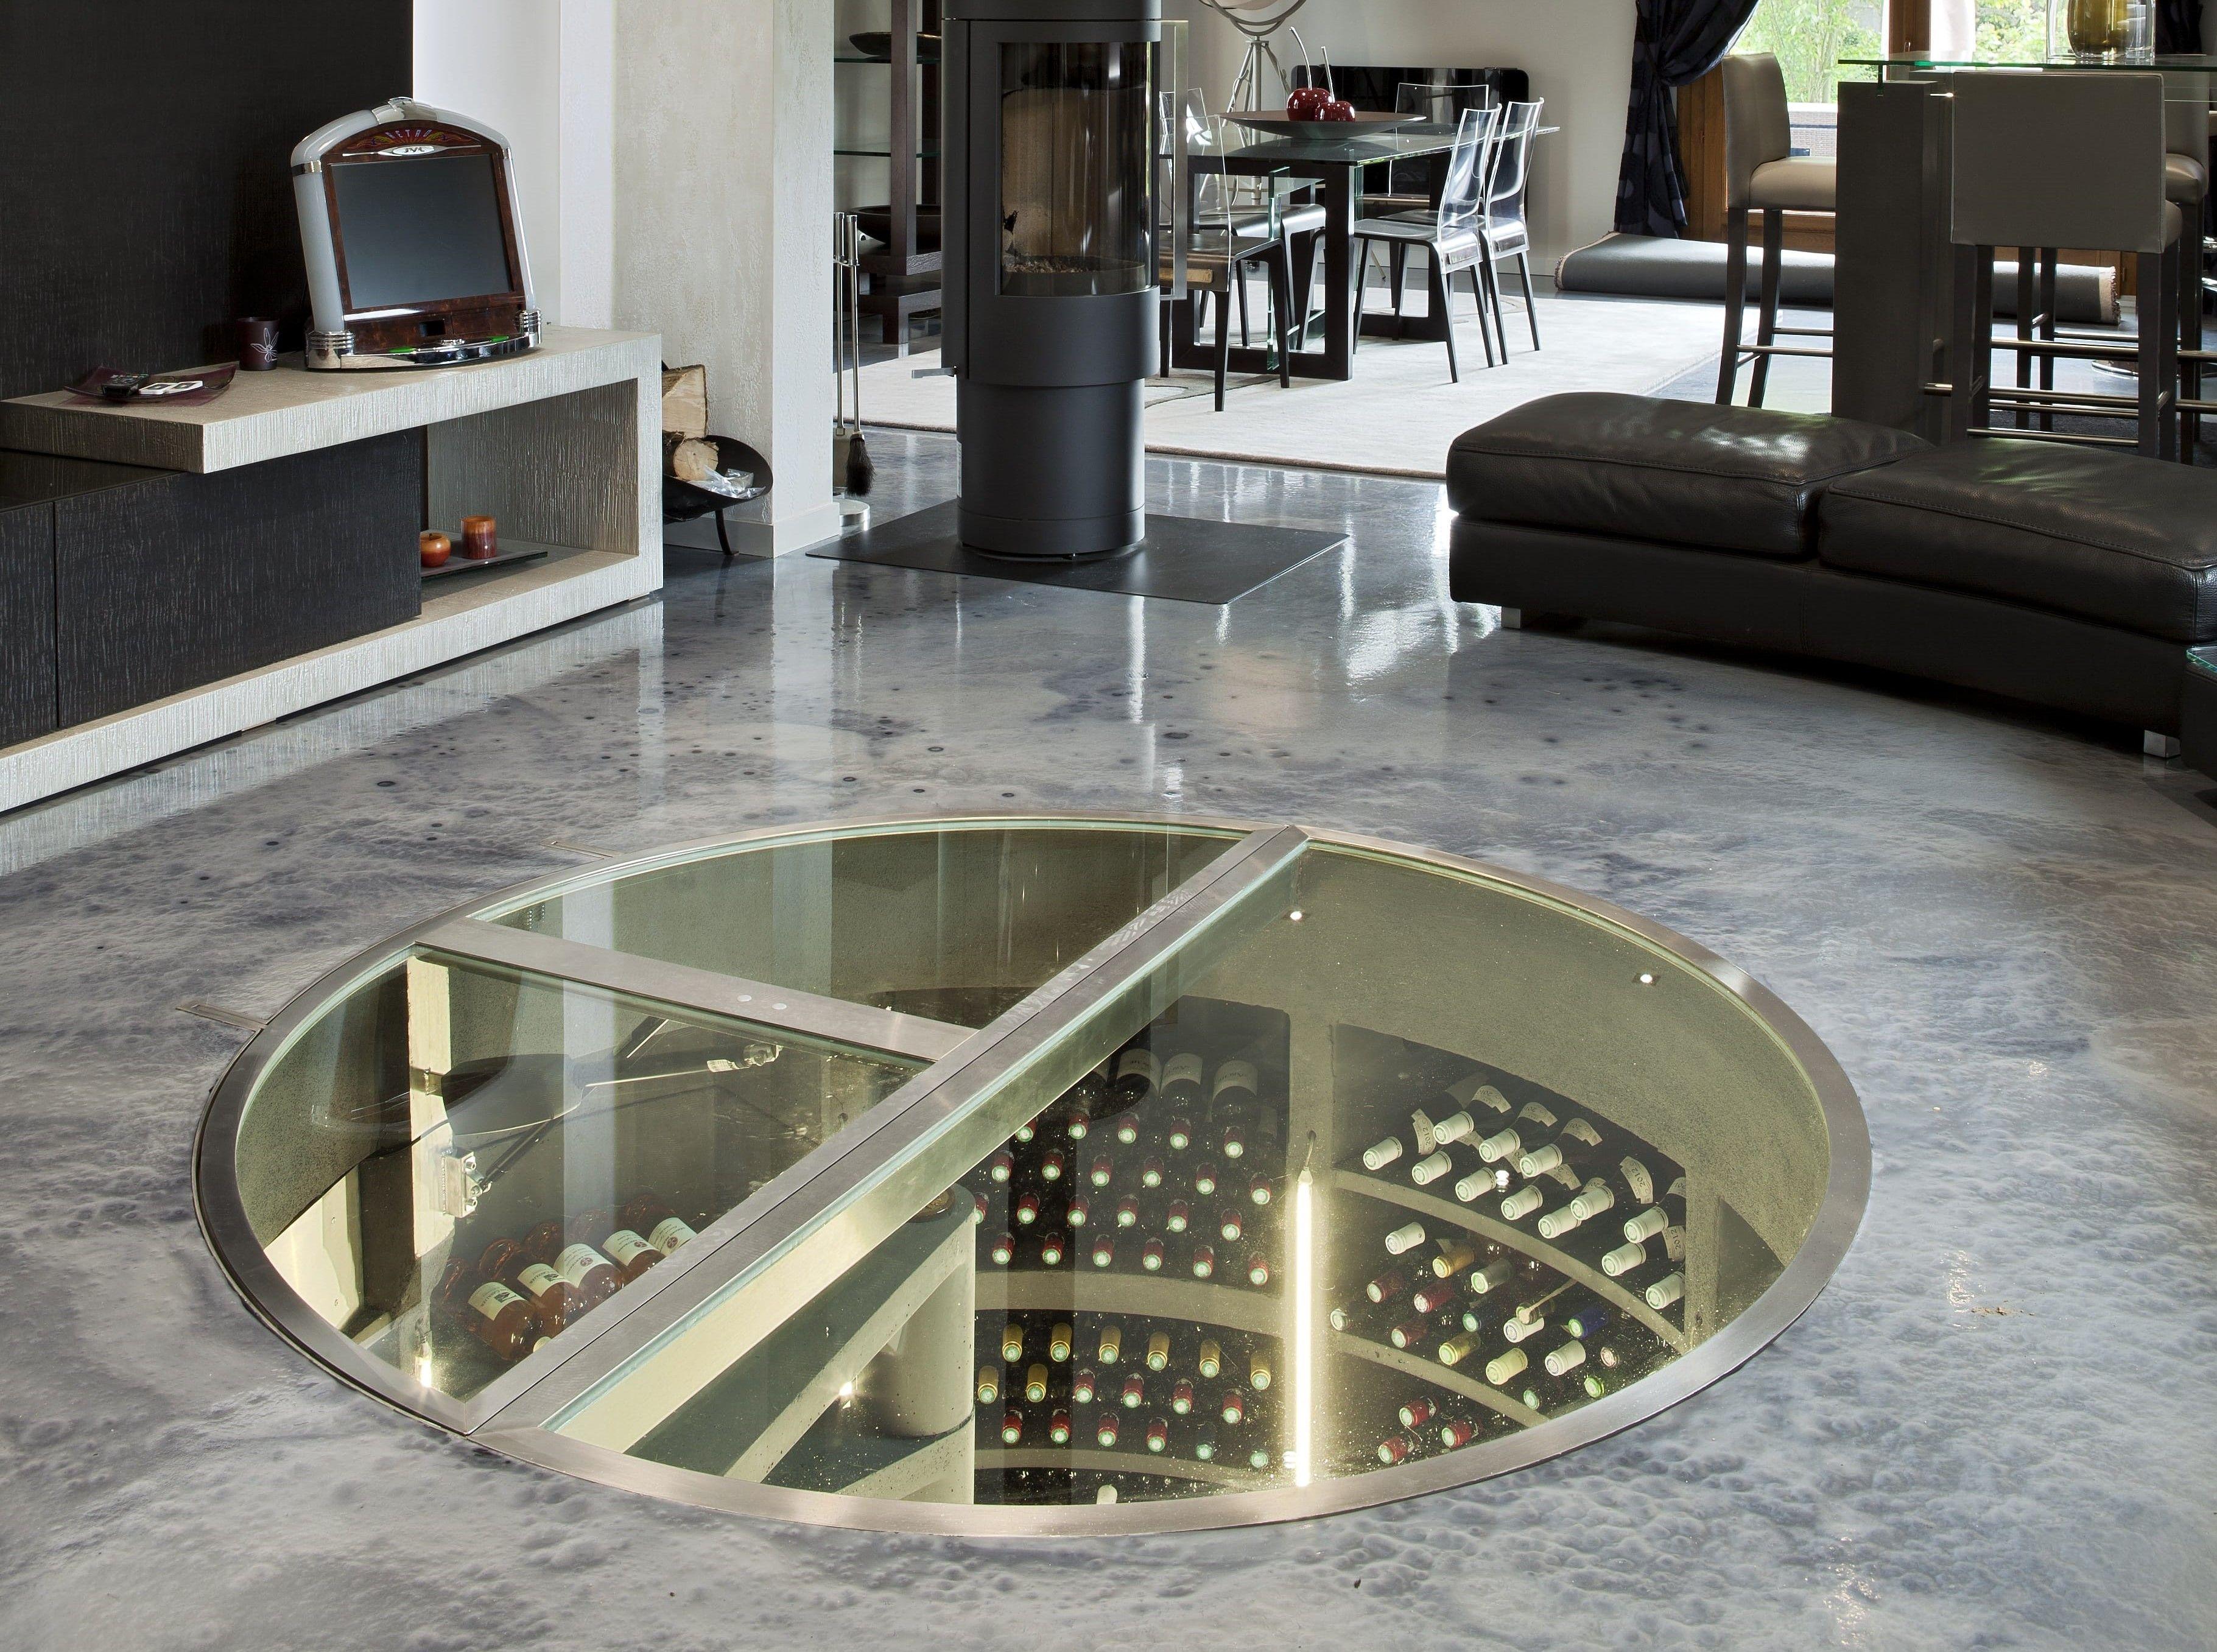 Concrete Underground Wine Cellars